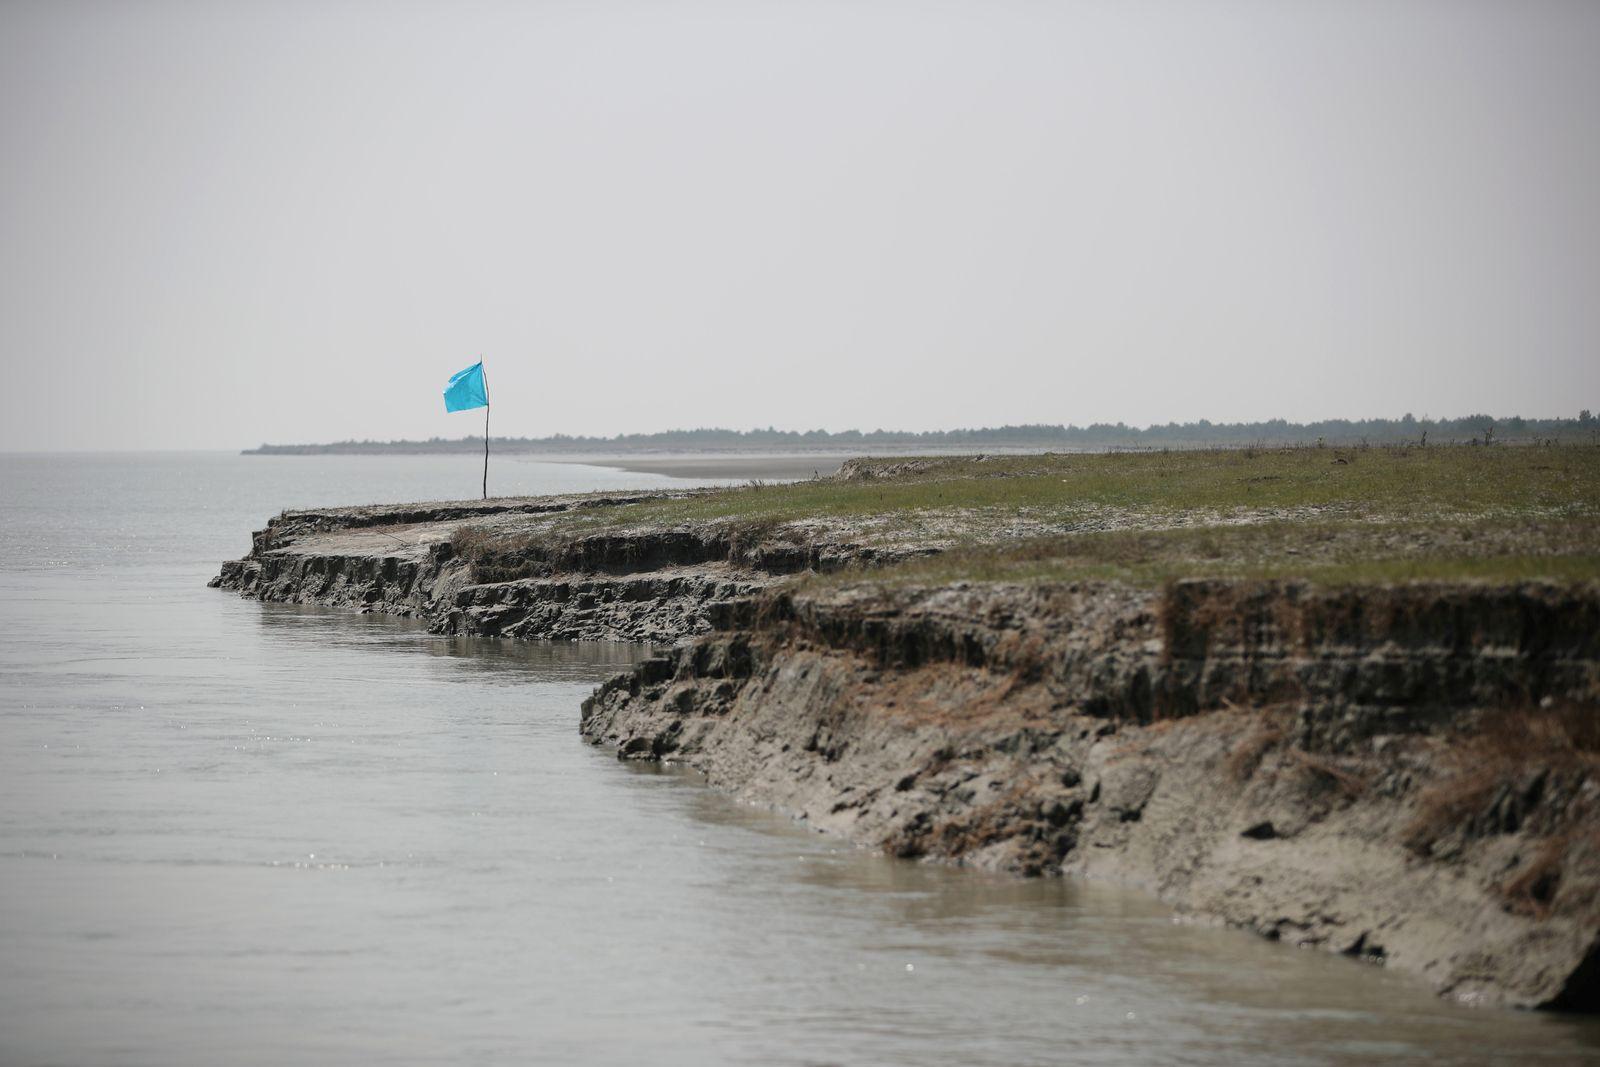 Bangladesh/ Rohingyas/ Bay of Bengal/ Bhasan Char